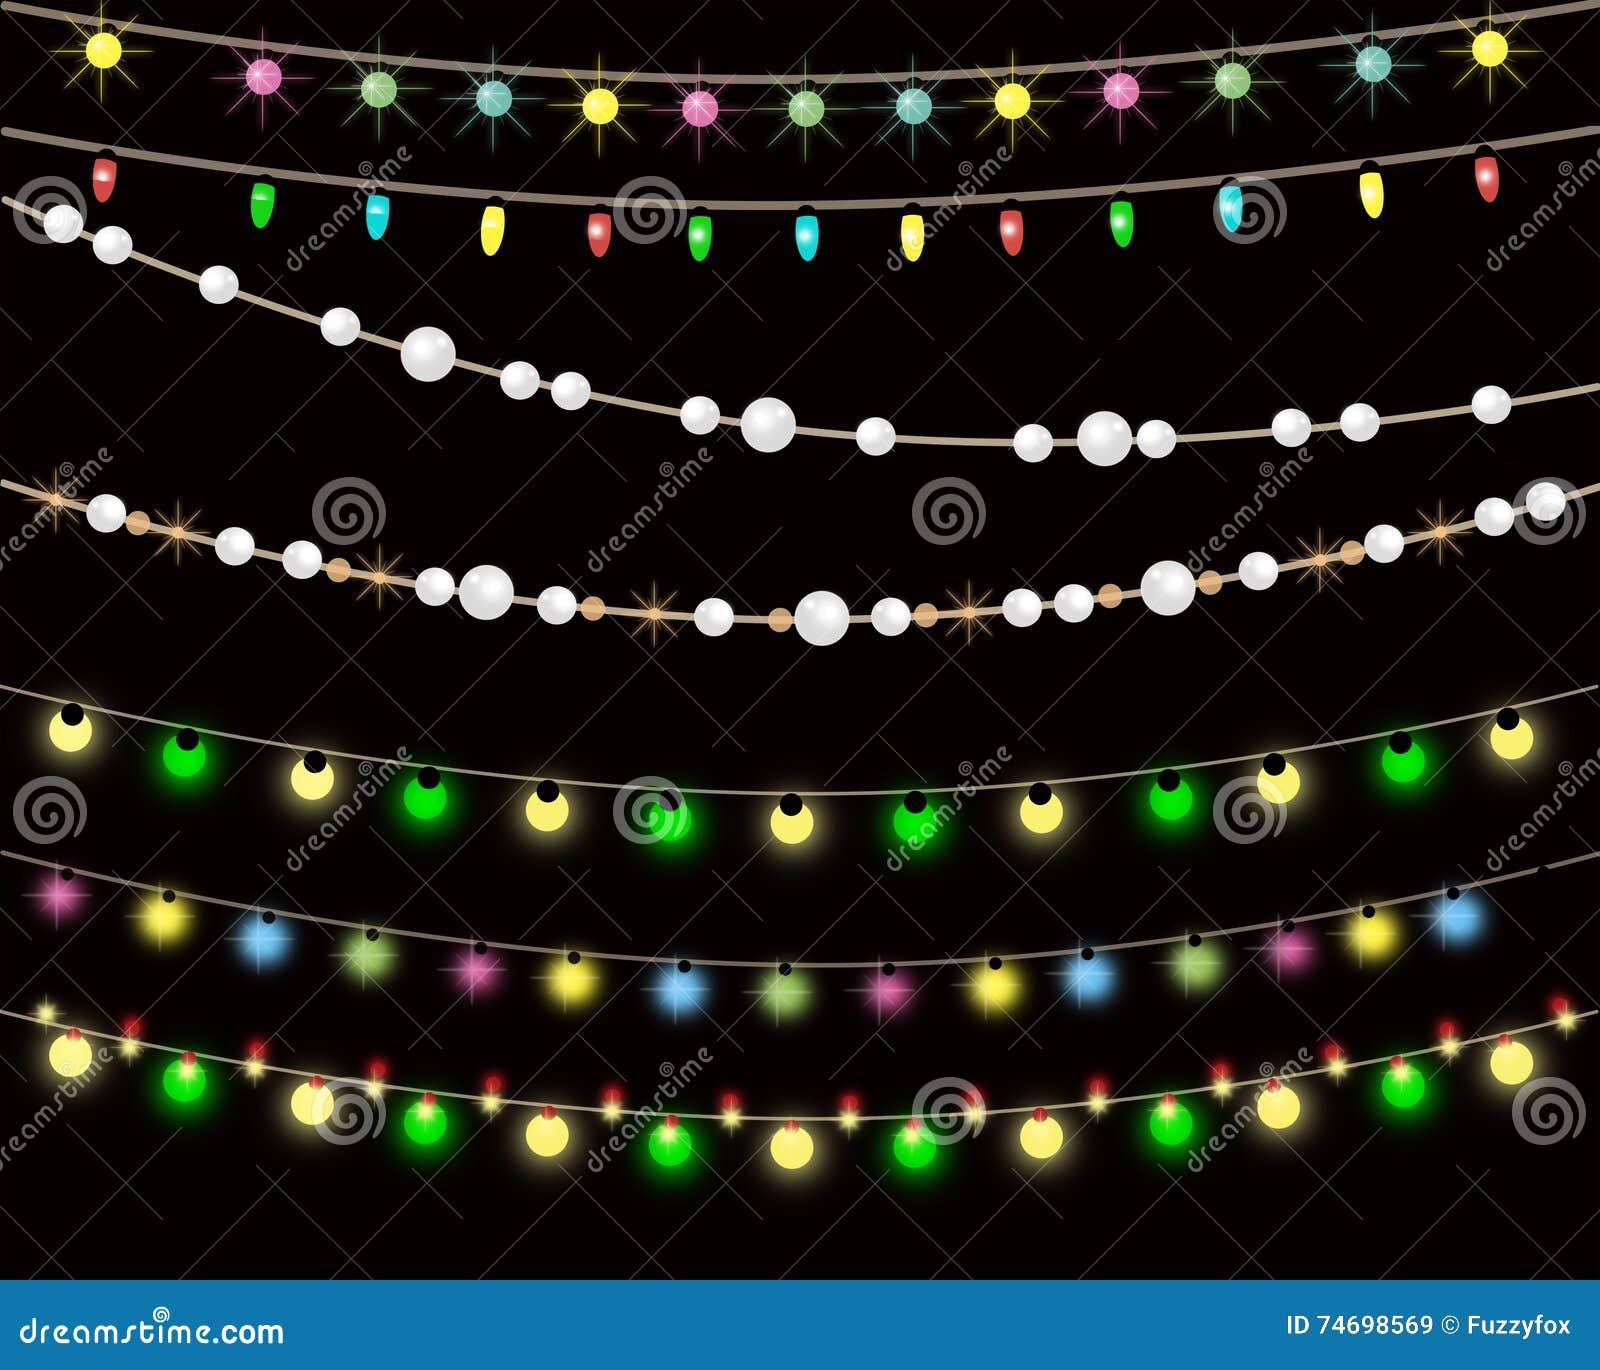 String Of Lights Illustration : Illustration Of Strings Of Christmas Lights, Dark Background Stock Illustration - Image: 74698569